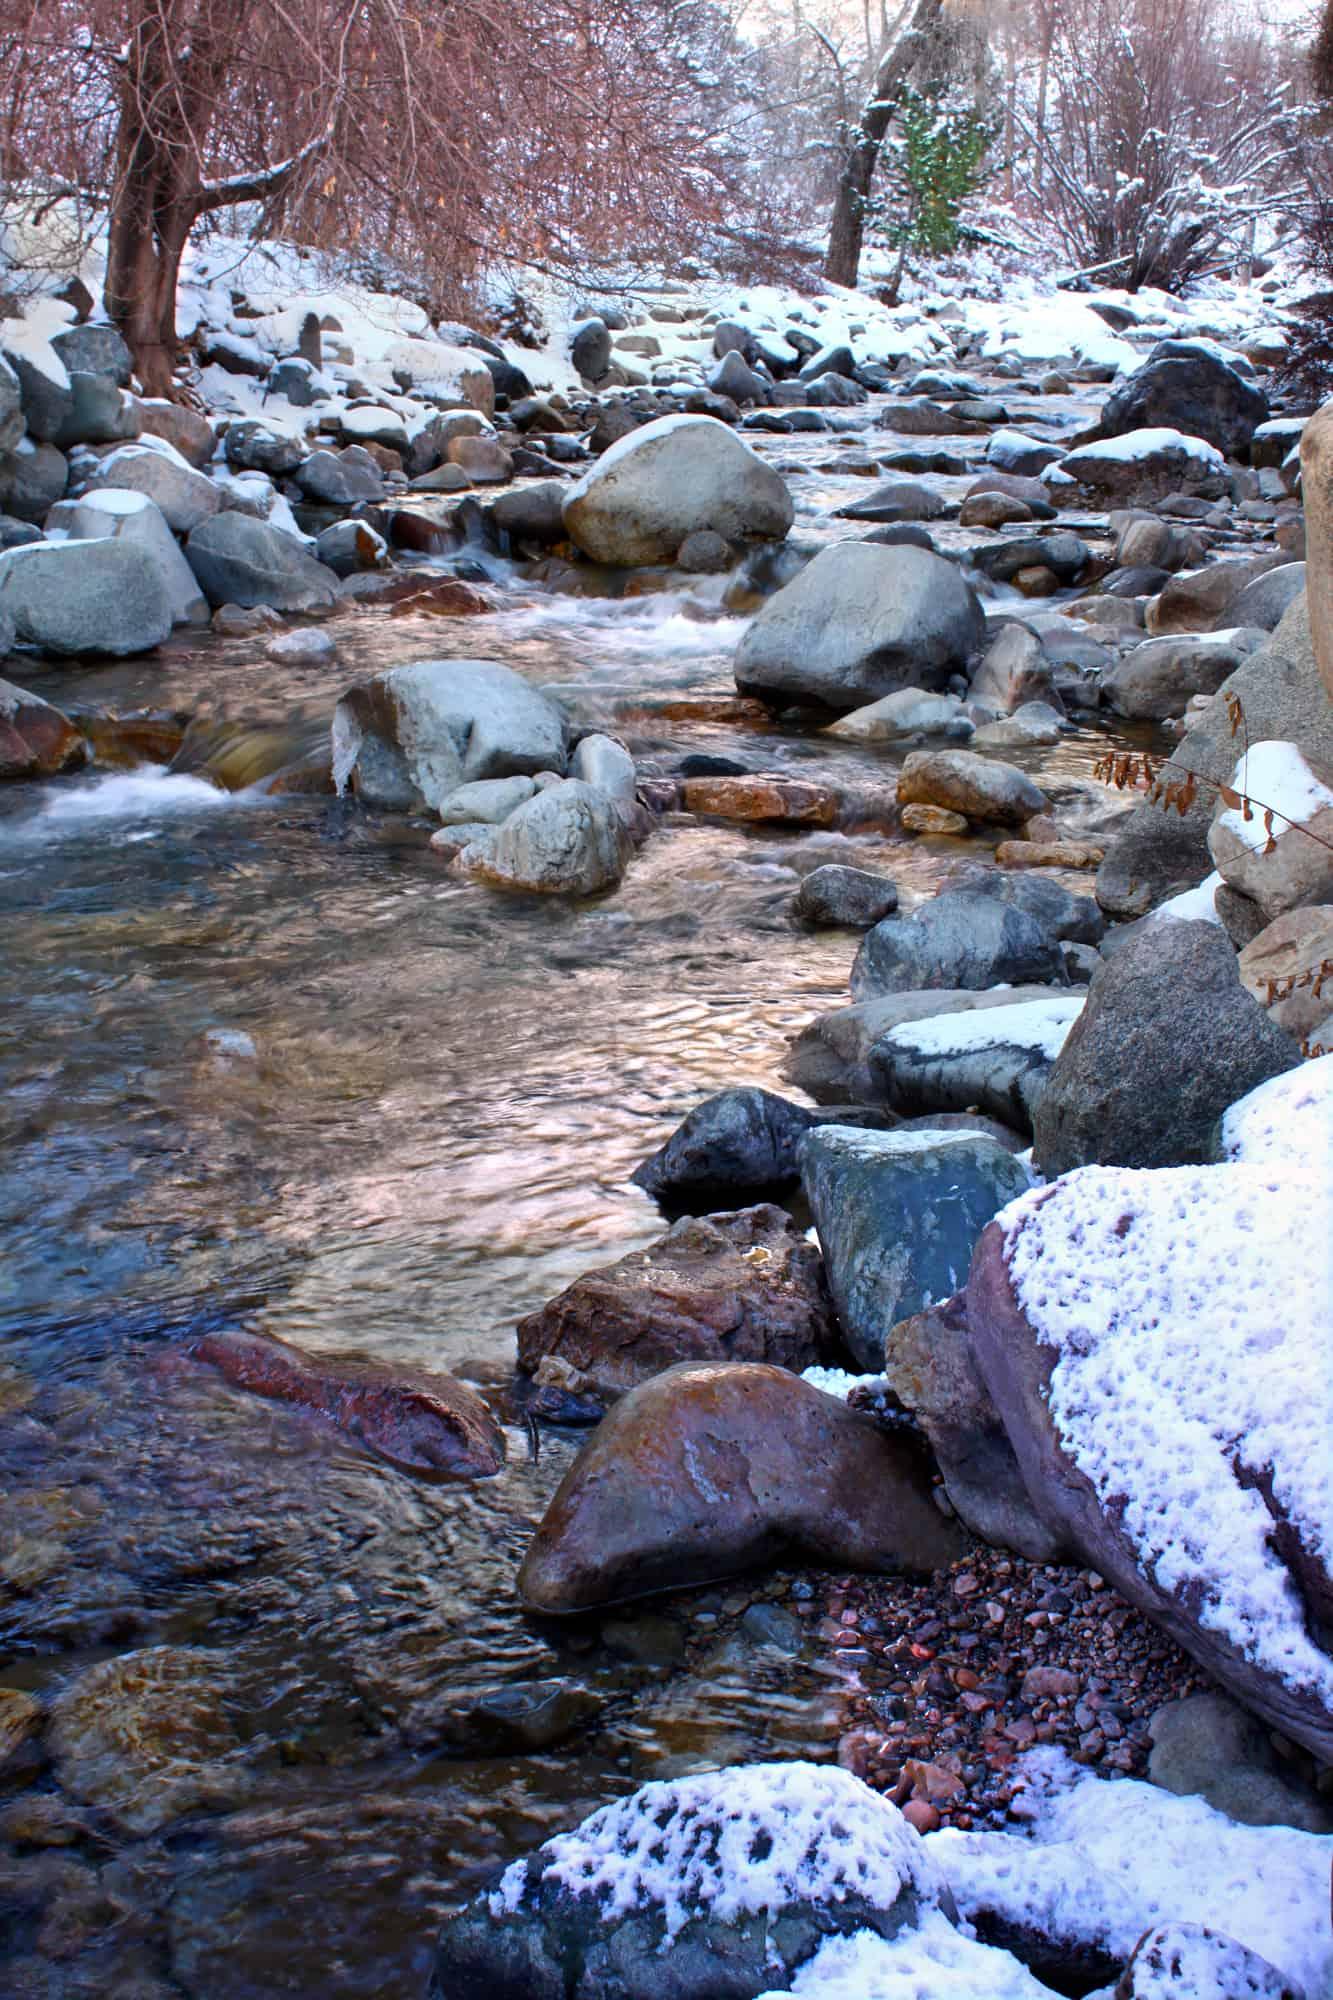 White River National